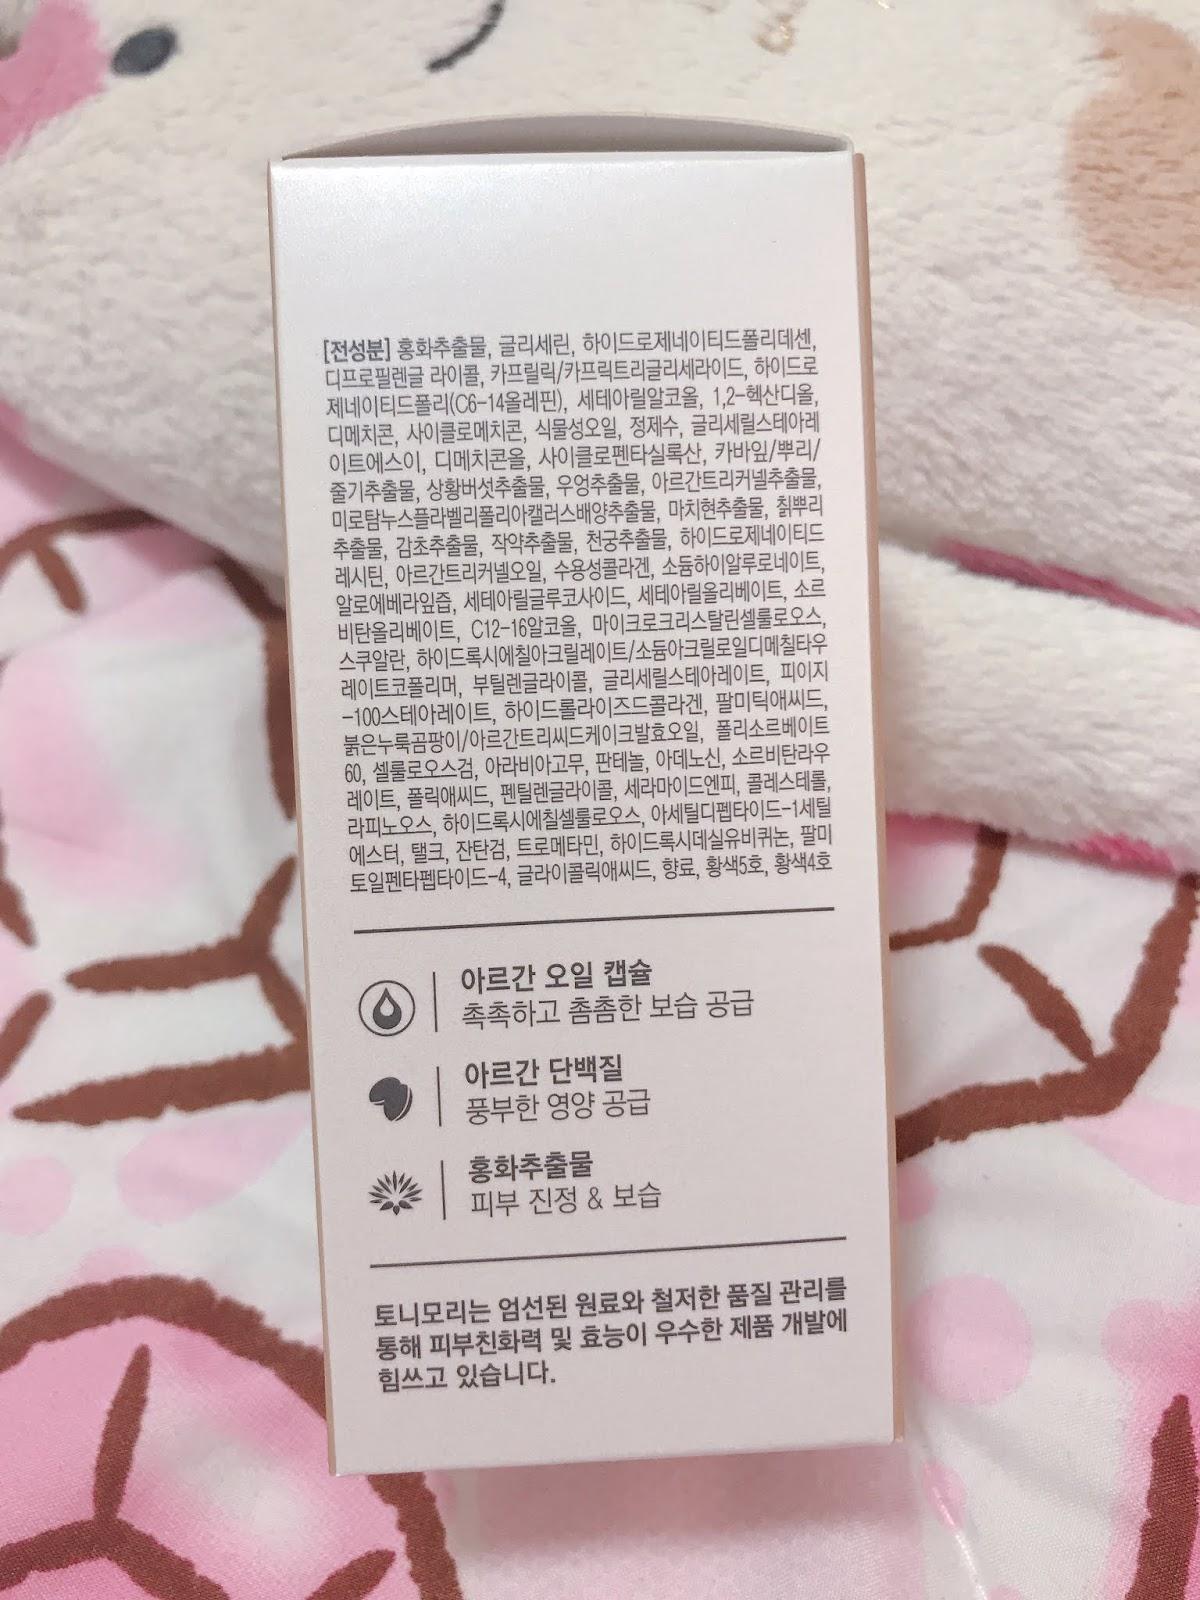 79a8db4bdc8695 Beautylife HK - ◕◡◕持續124小時的水潤彈力保濕♥TONYMOLY 花漾活肌 ...